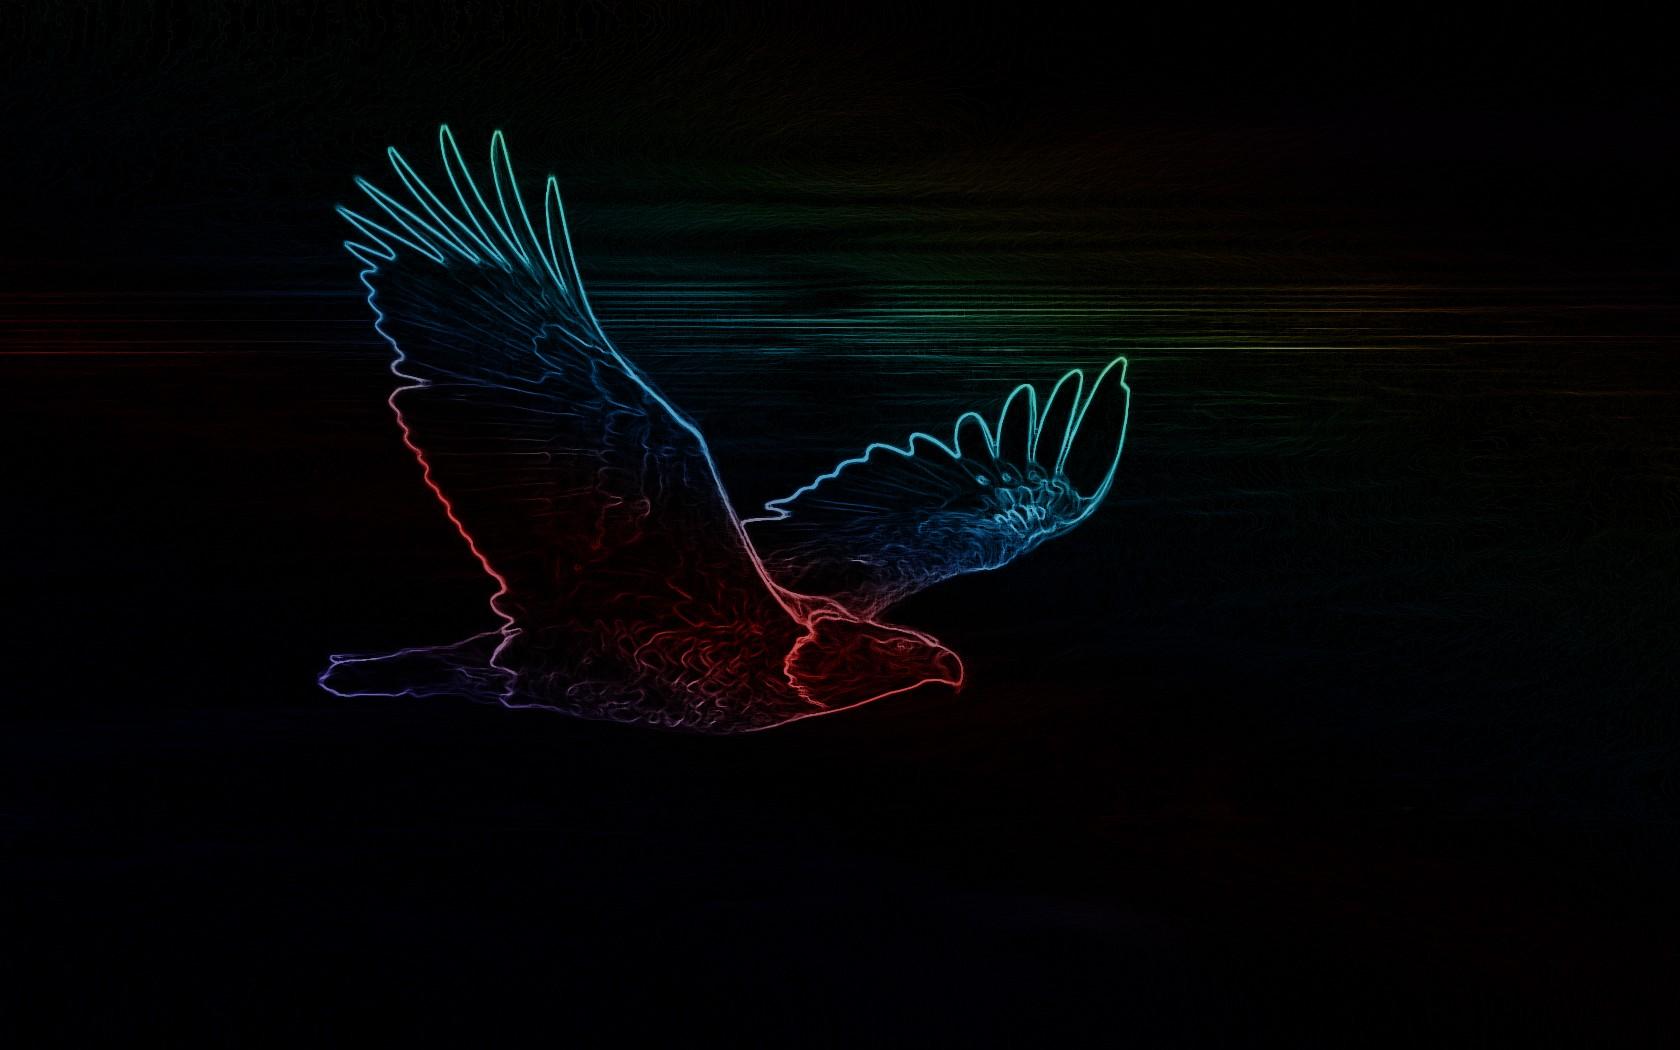 Wallpaper : black, night, neon, eagle, light, darkness, wing ...